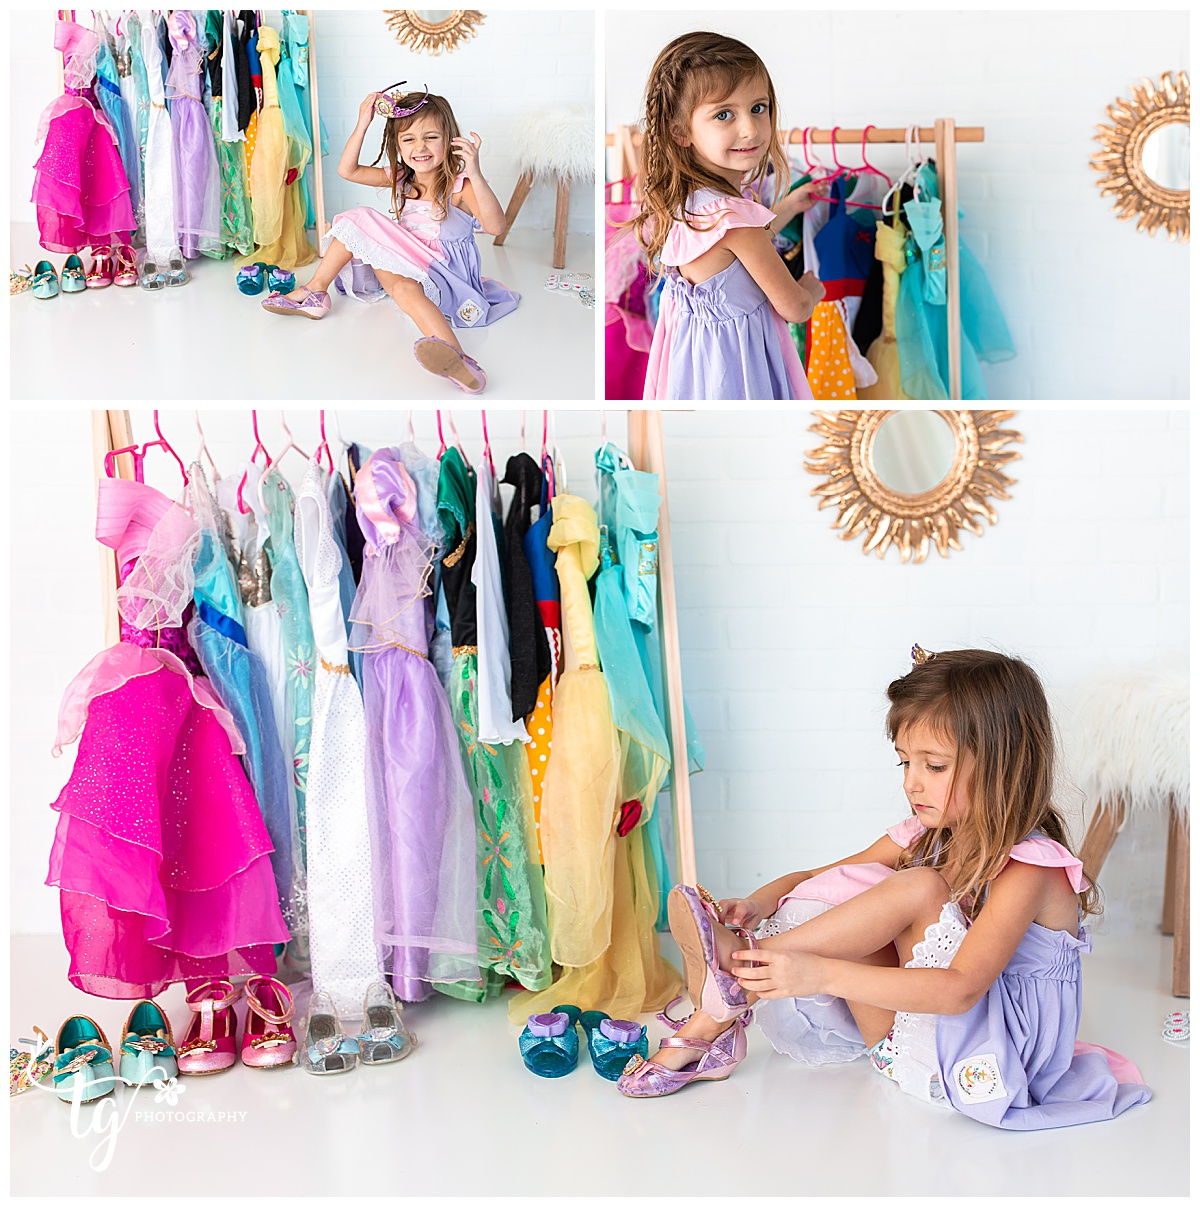 Disney princess inspired birthday photo session